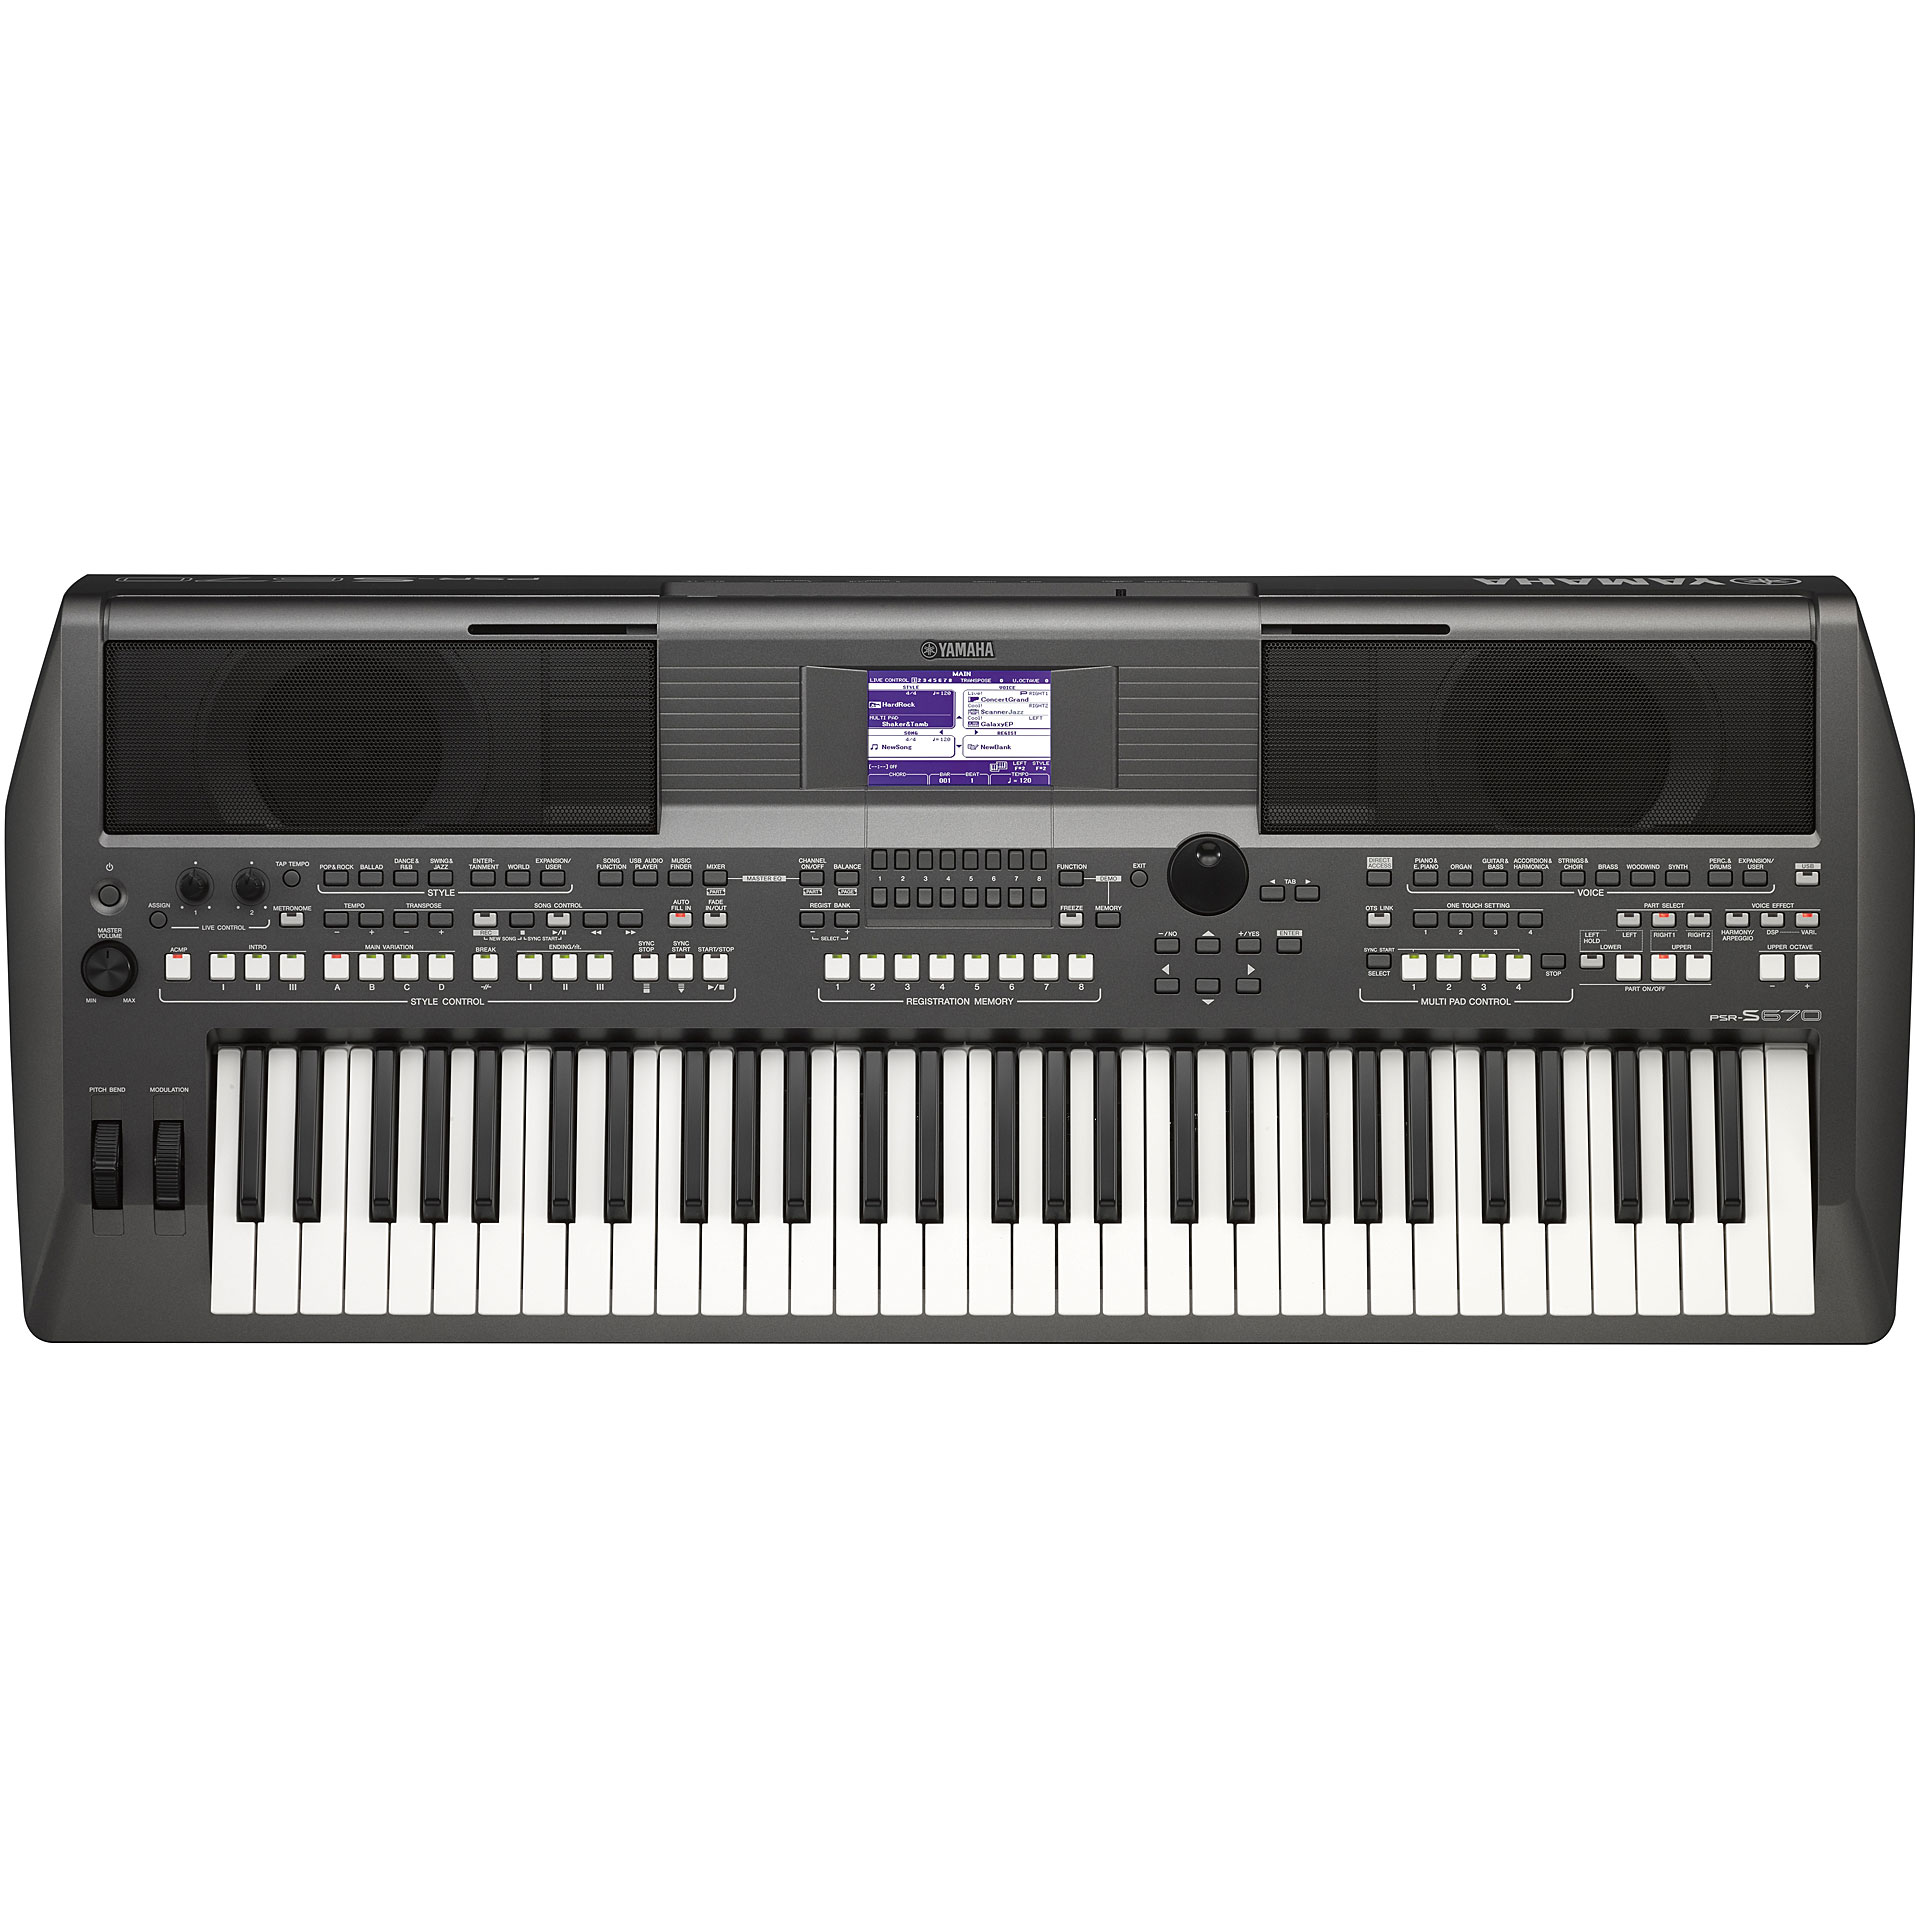 Yamaha psr s670 keyboard for Yamaha synthesizer keyboard